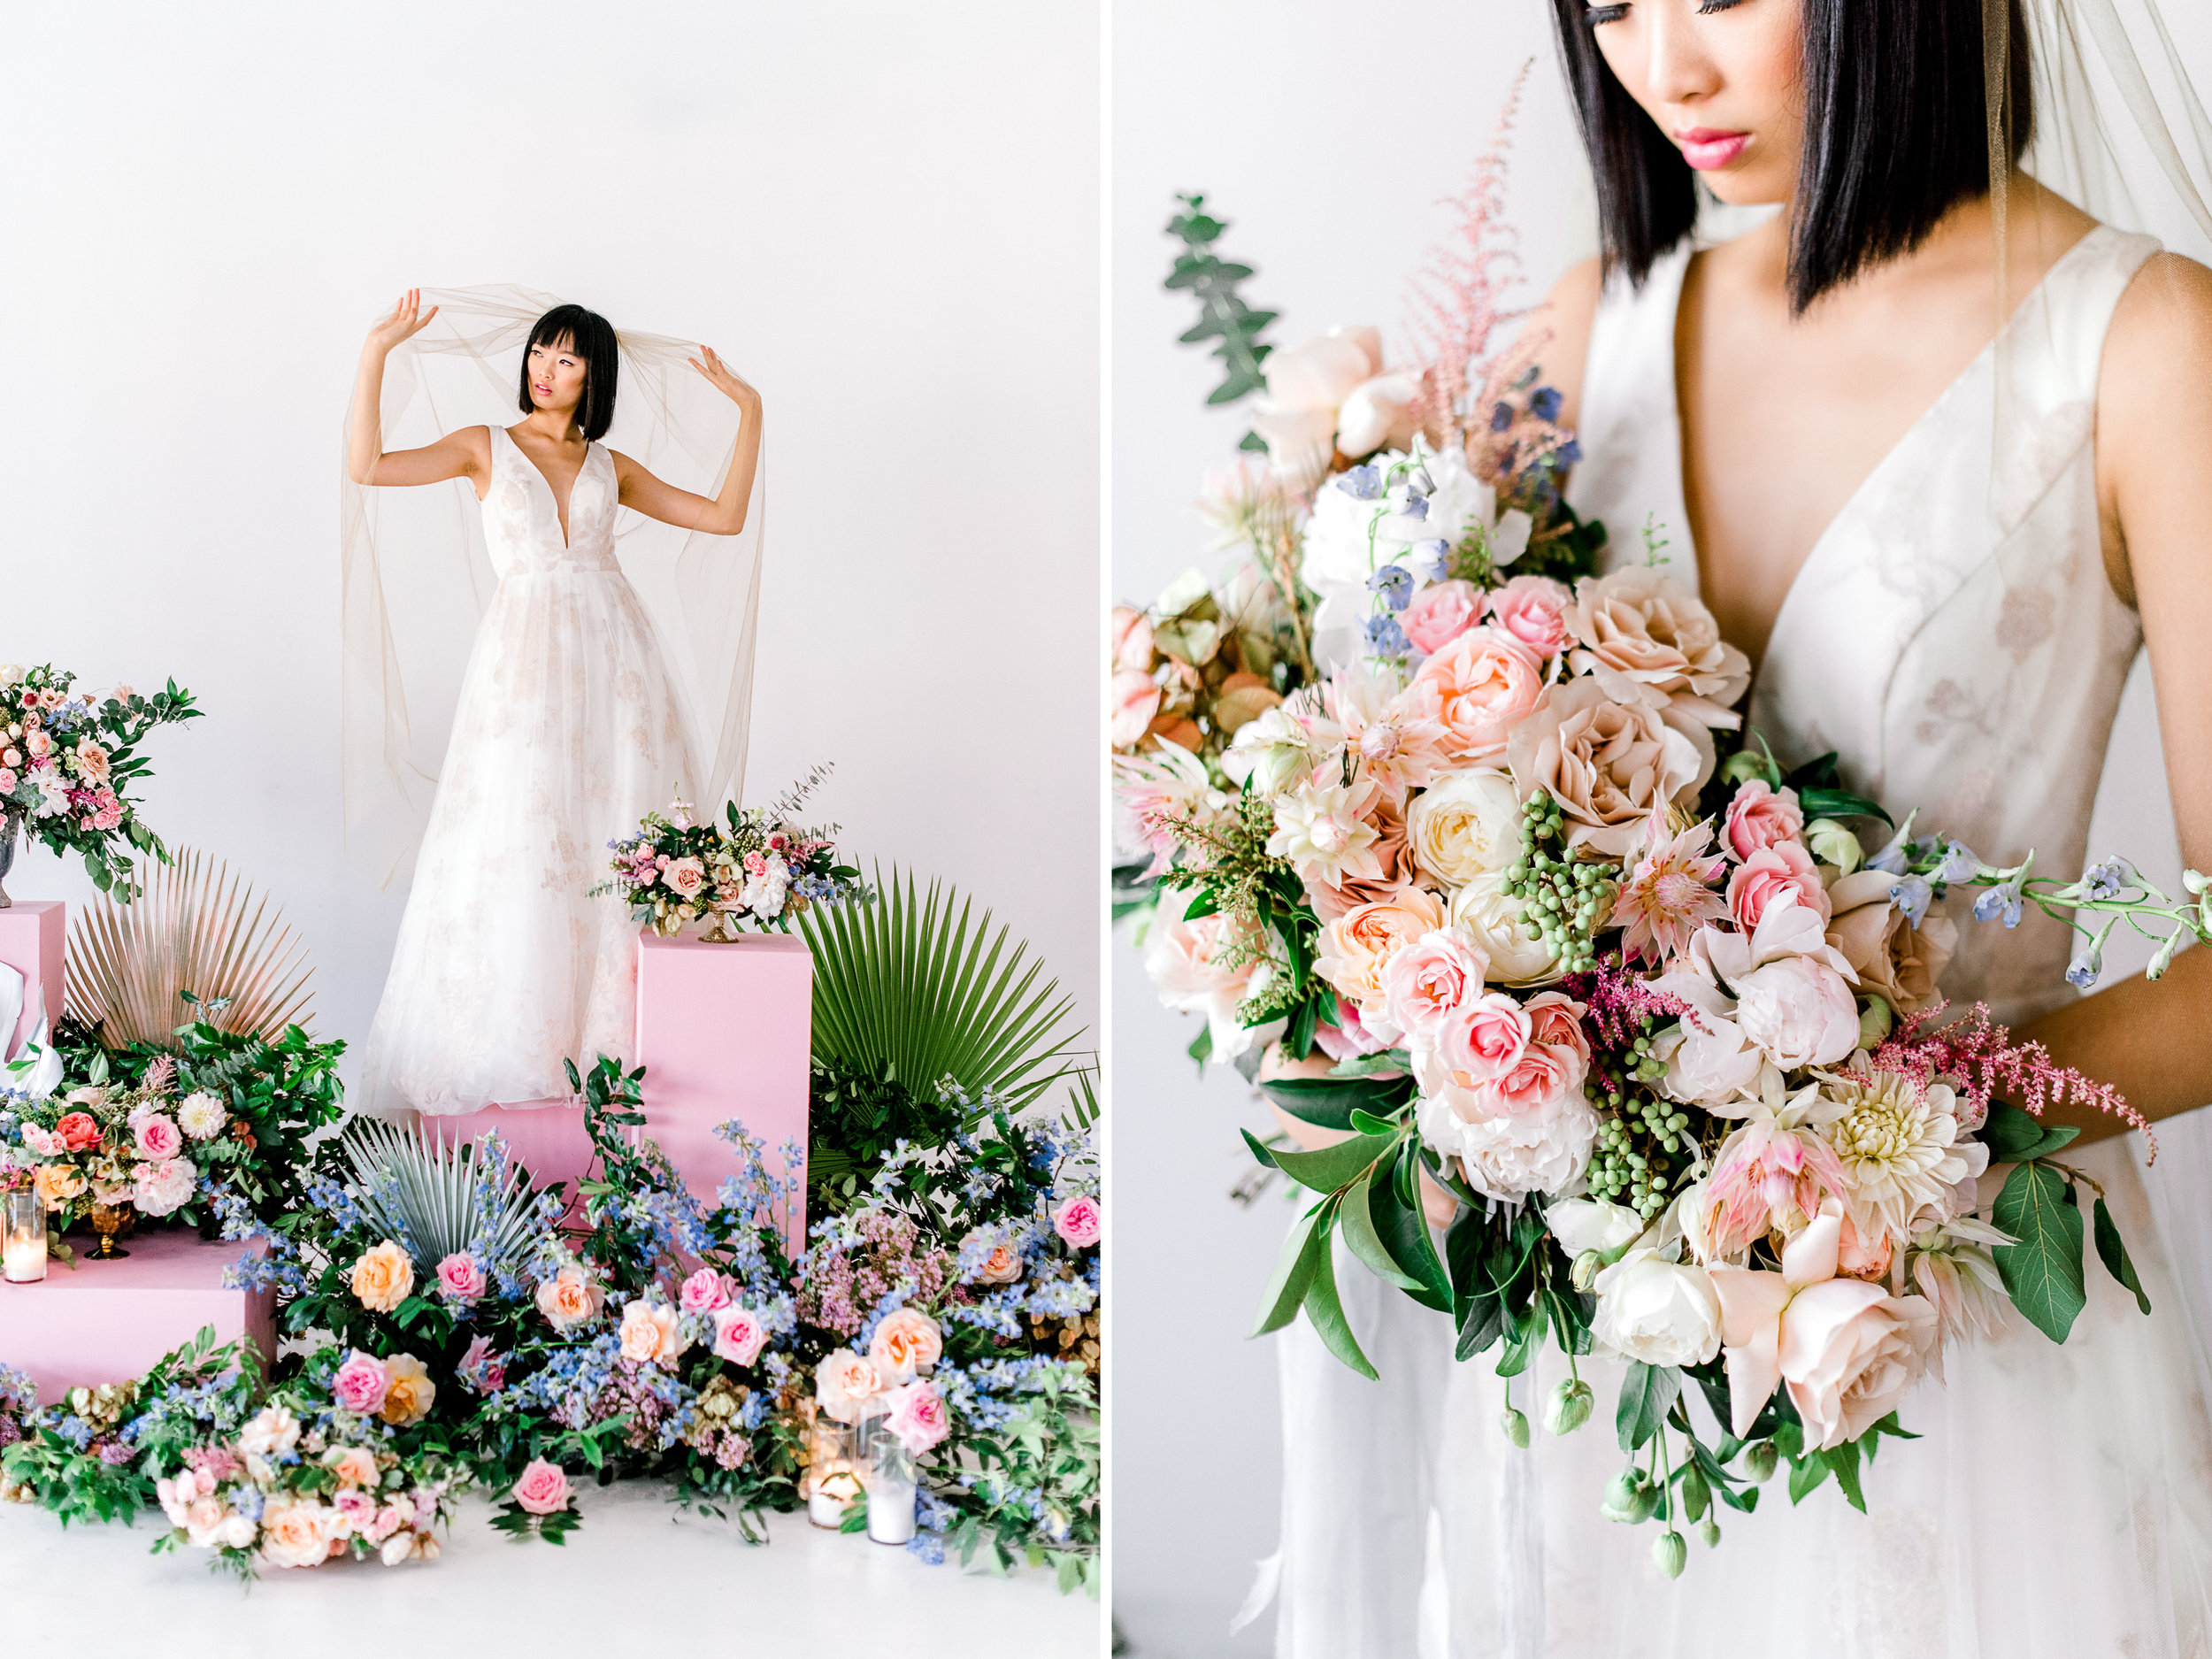 Houston-Wedding-Photographer-Editorial-Fine-Art-Film-Destination-Dallas-Texas-Mibellarosa-Josh-Dana-Fernandez-Photography-120.jpg